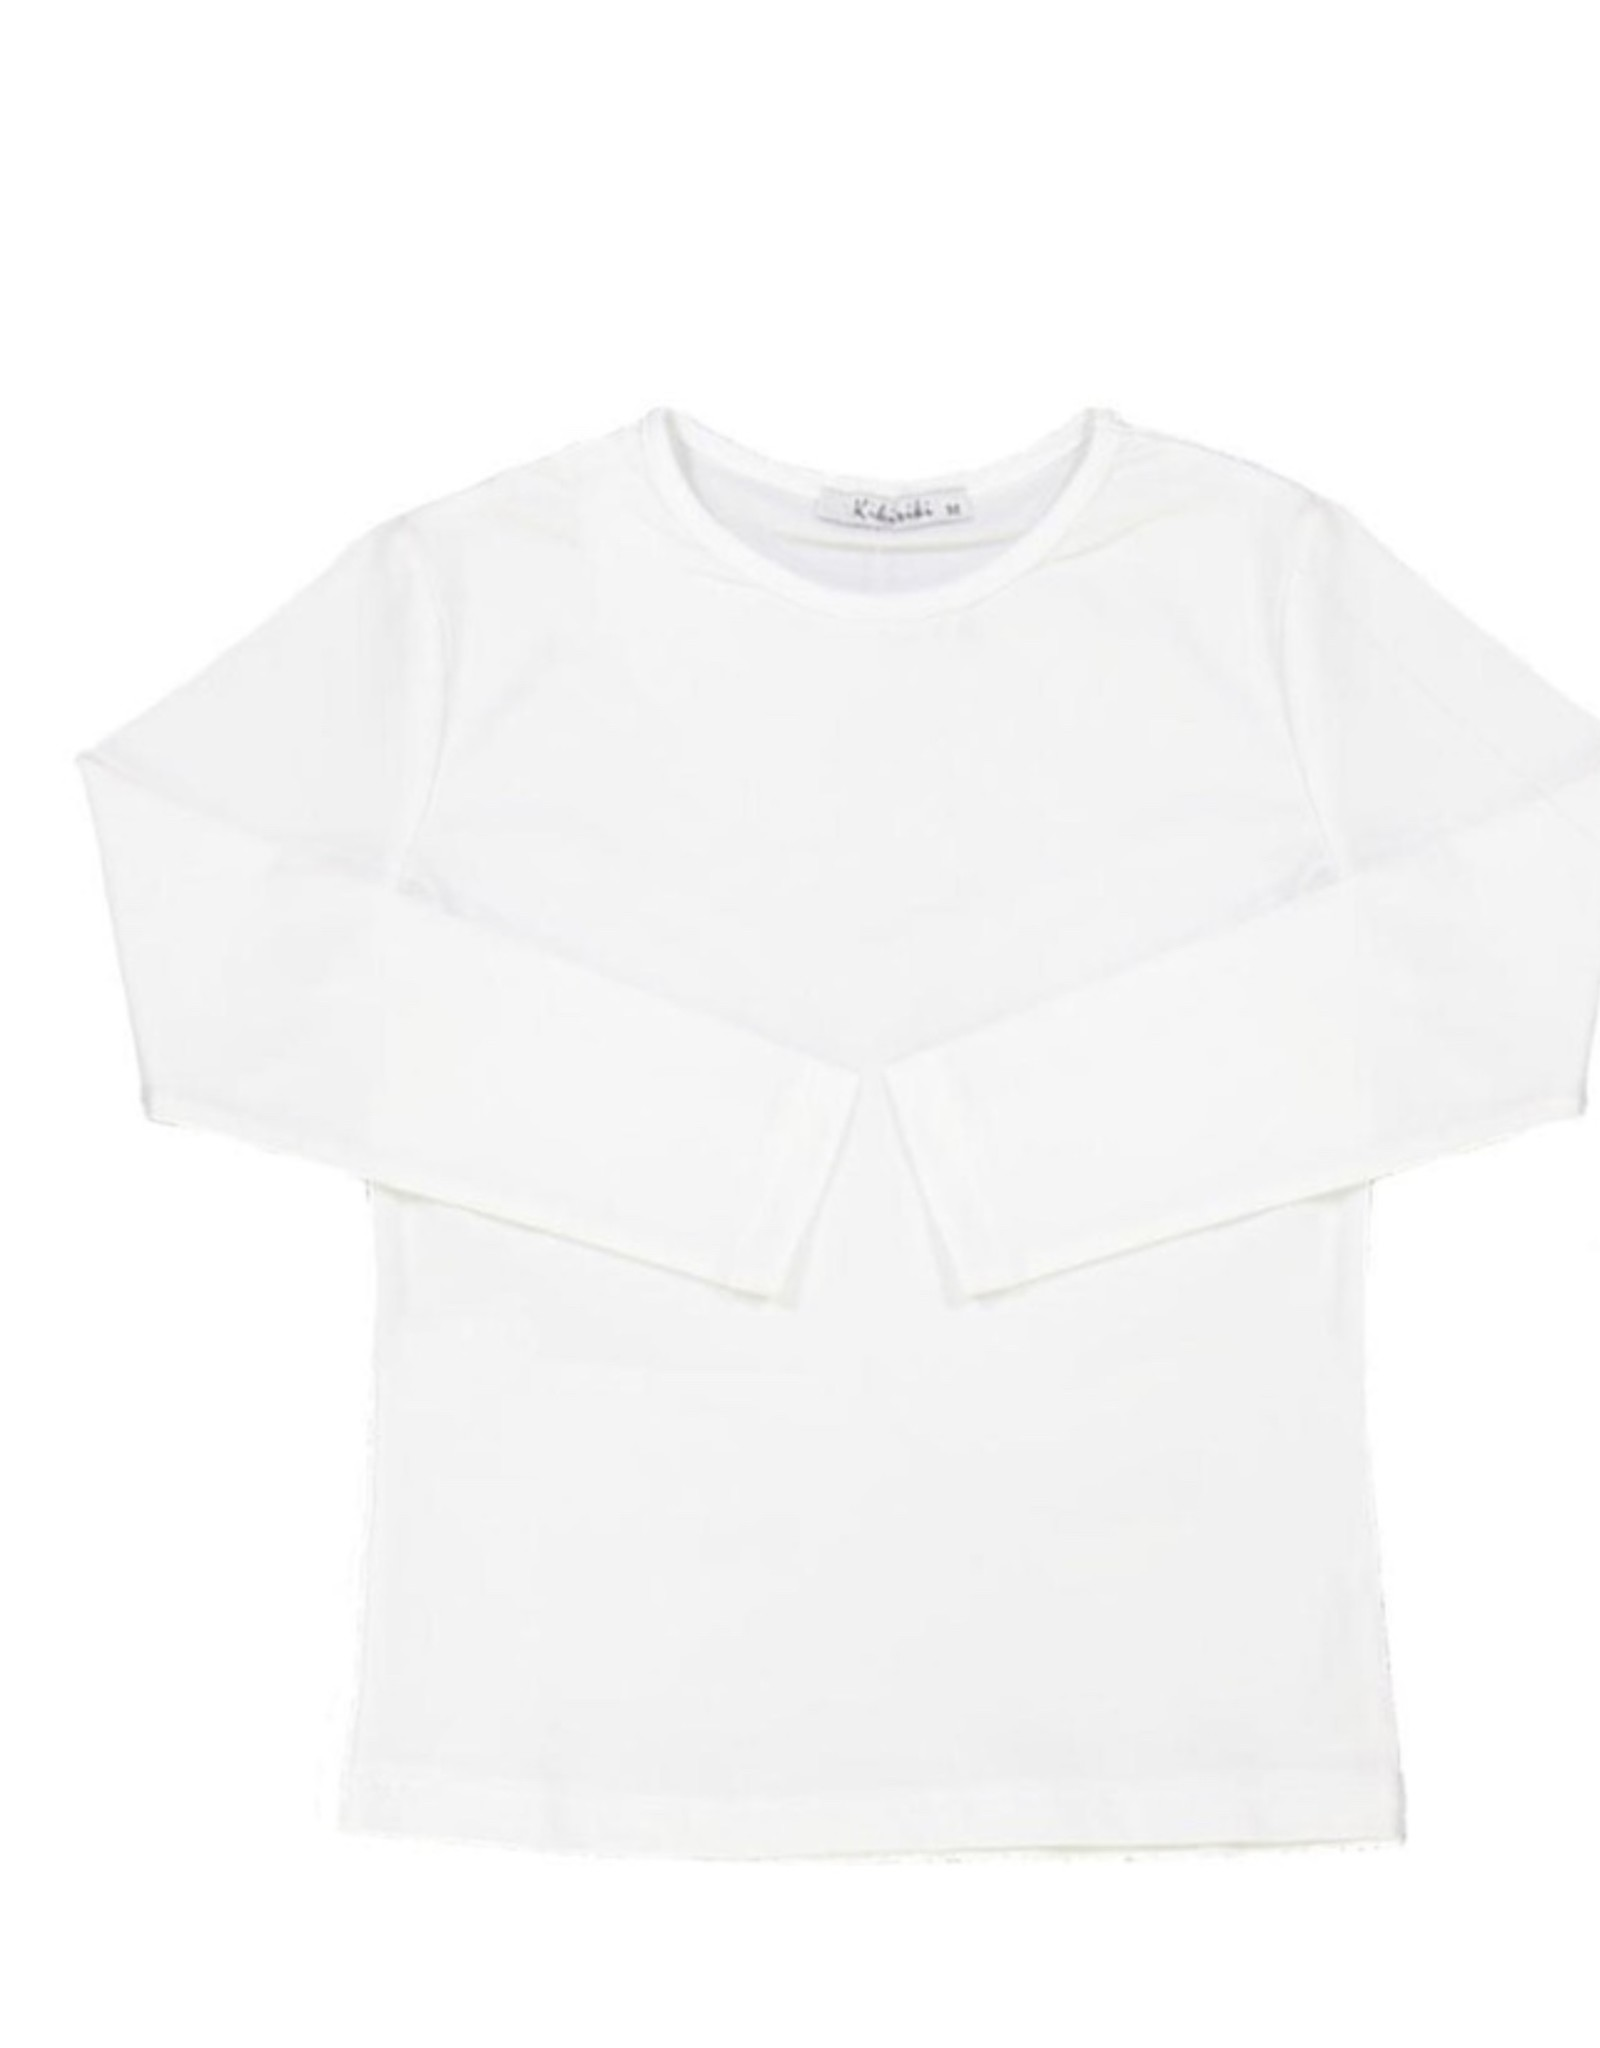 Kiki Riki Kiki Riki Girls 3/4 Length Sleeve Lycra Shell 18921